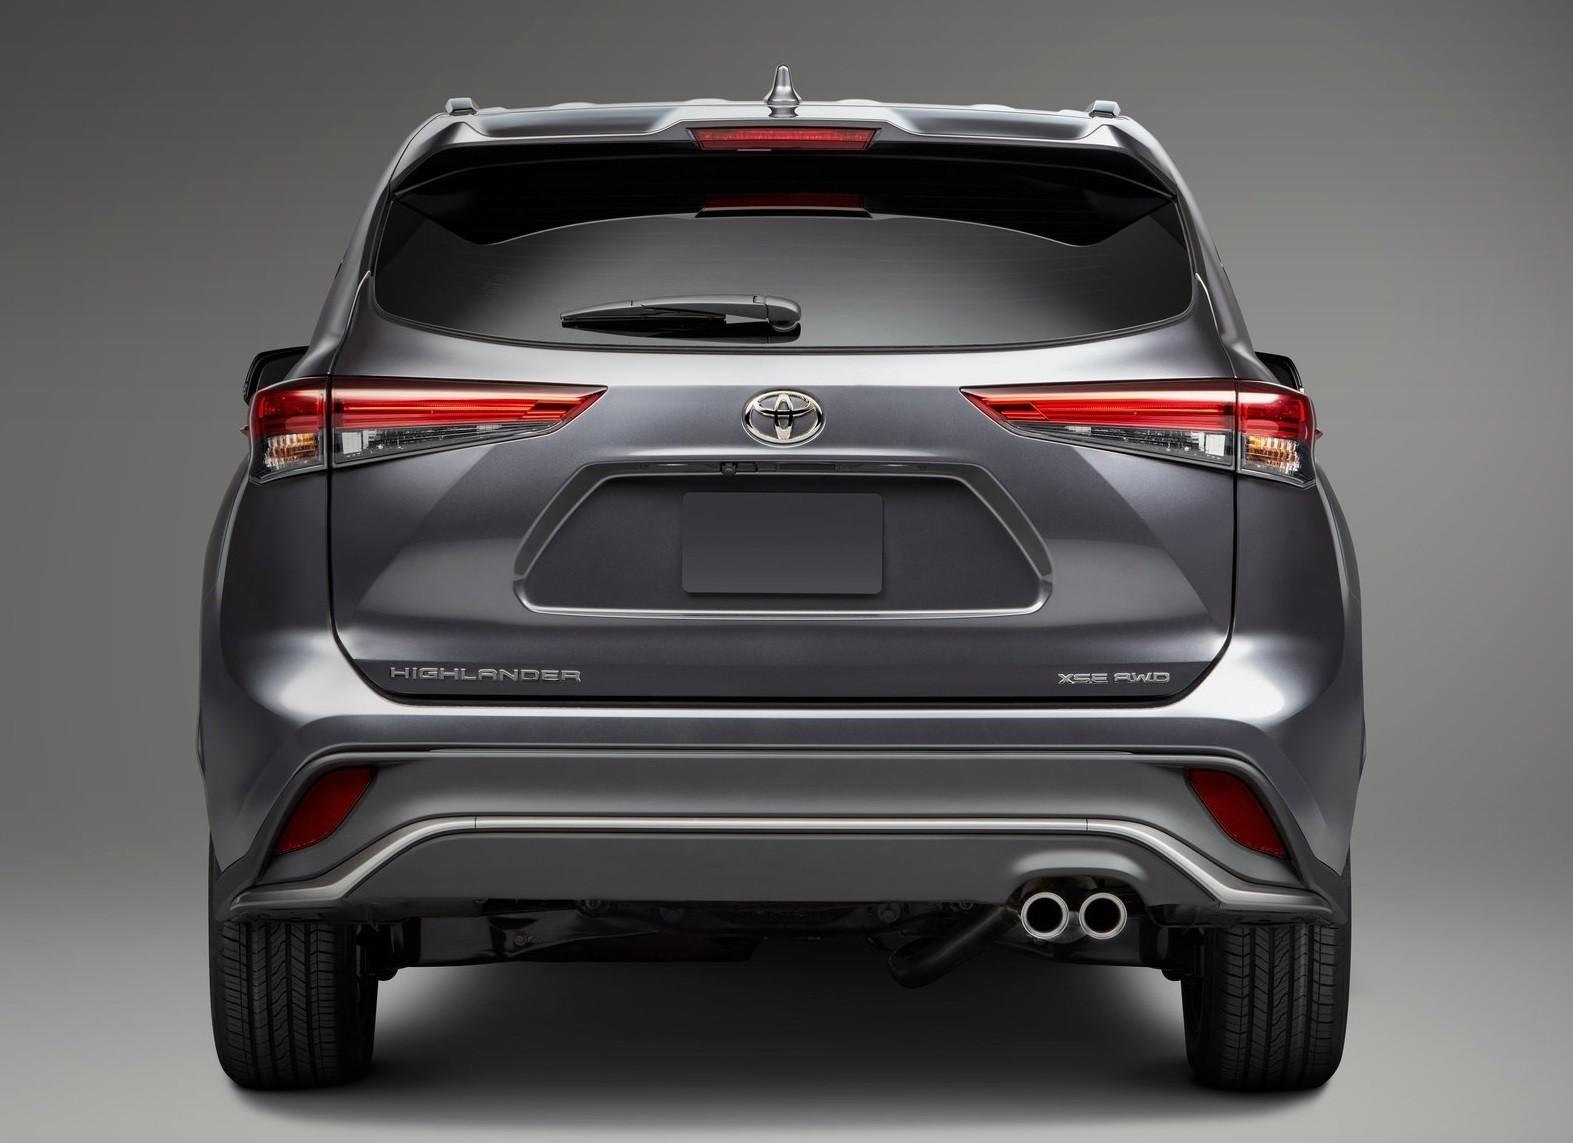 Foto de Toyota Highlander XSE 2021 (4/9)